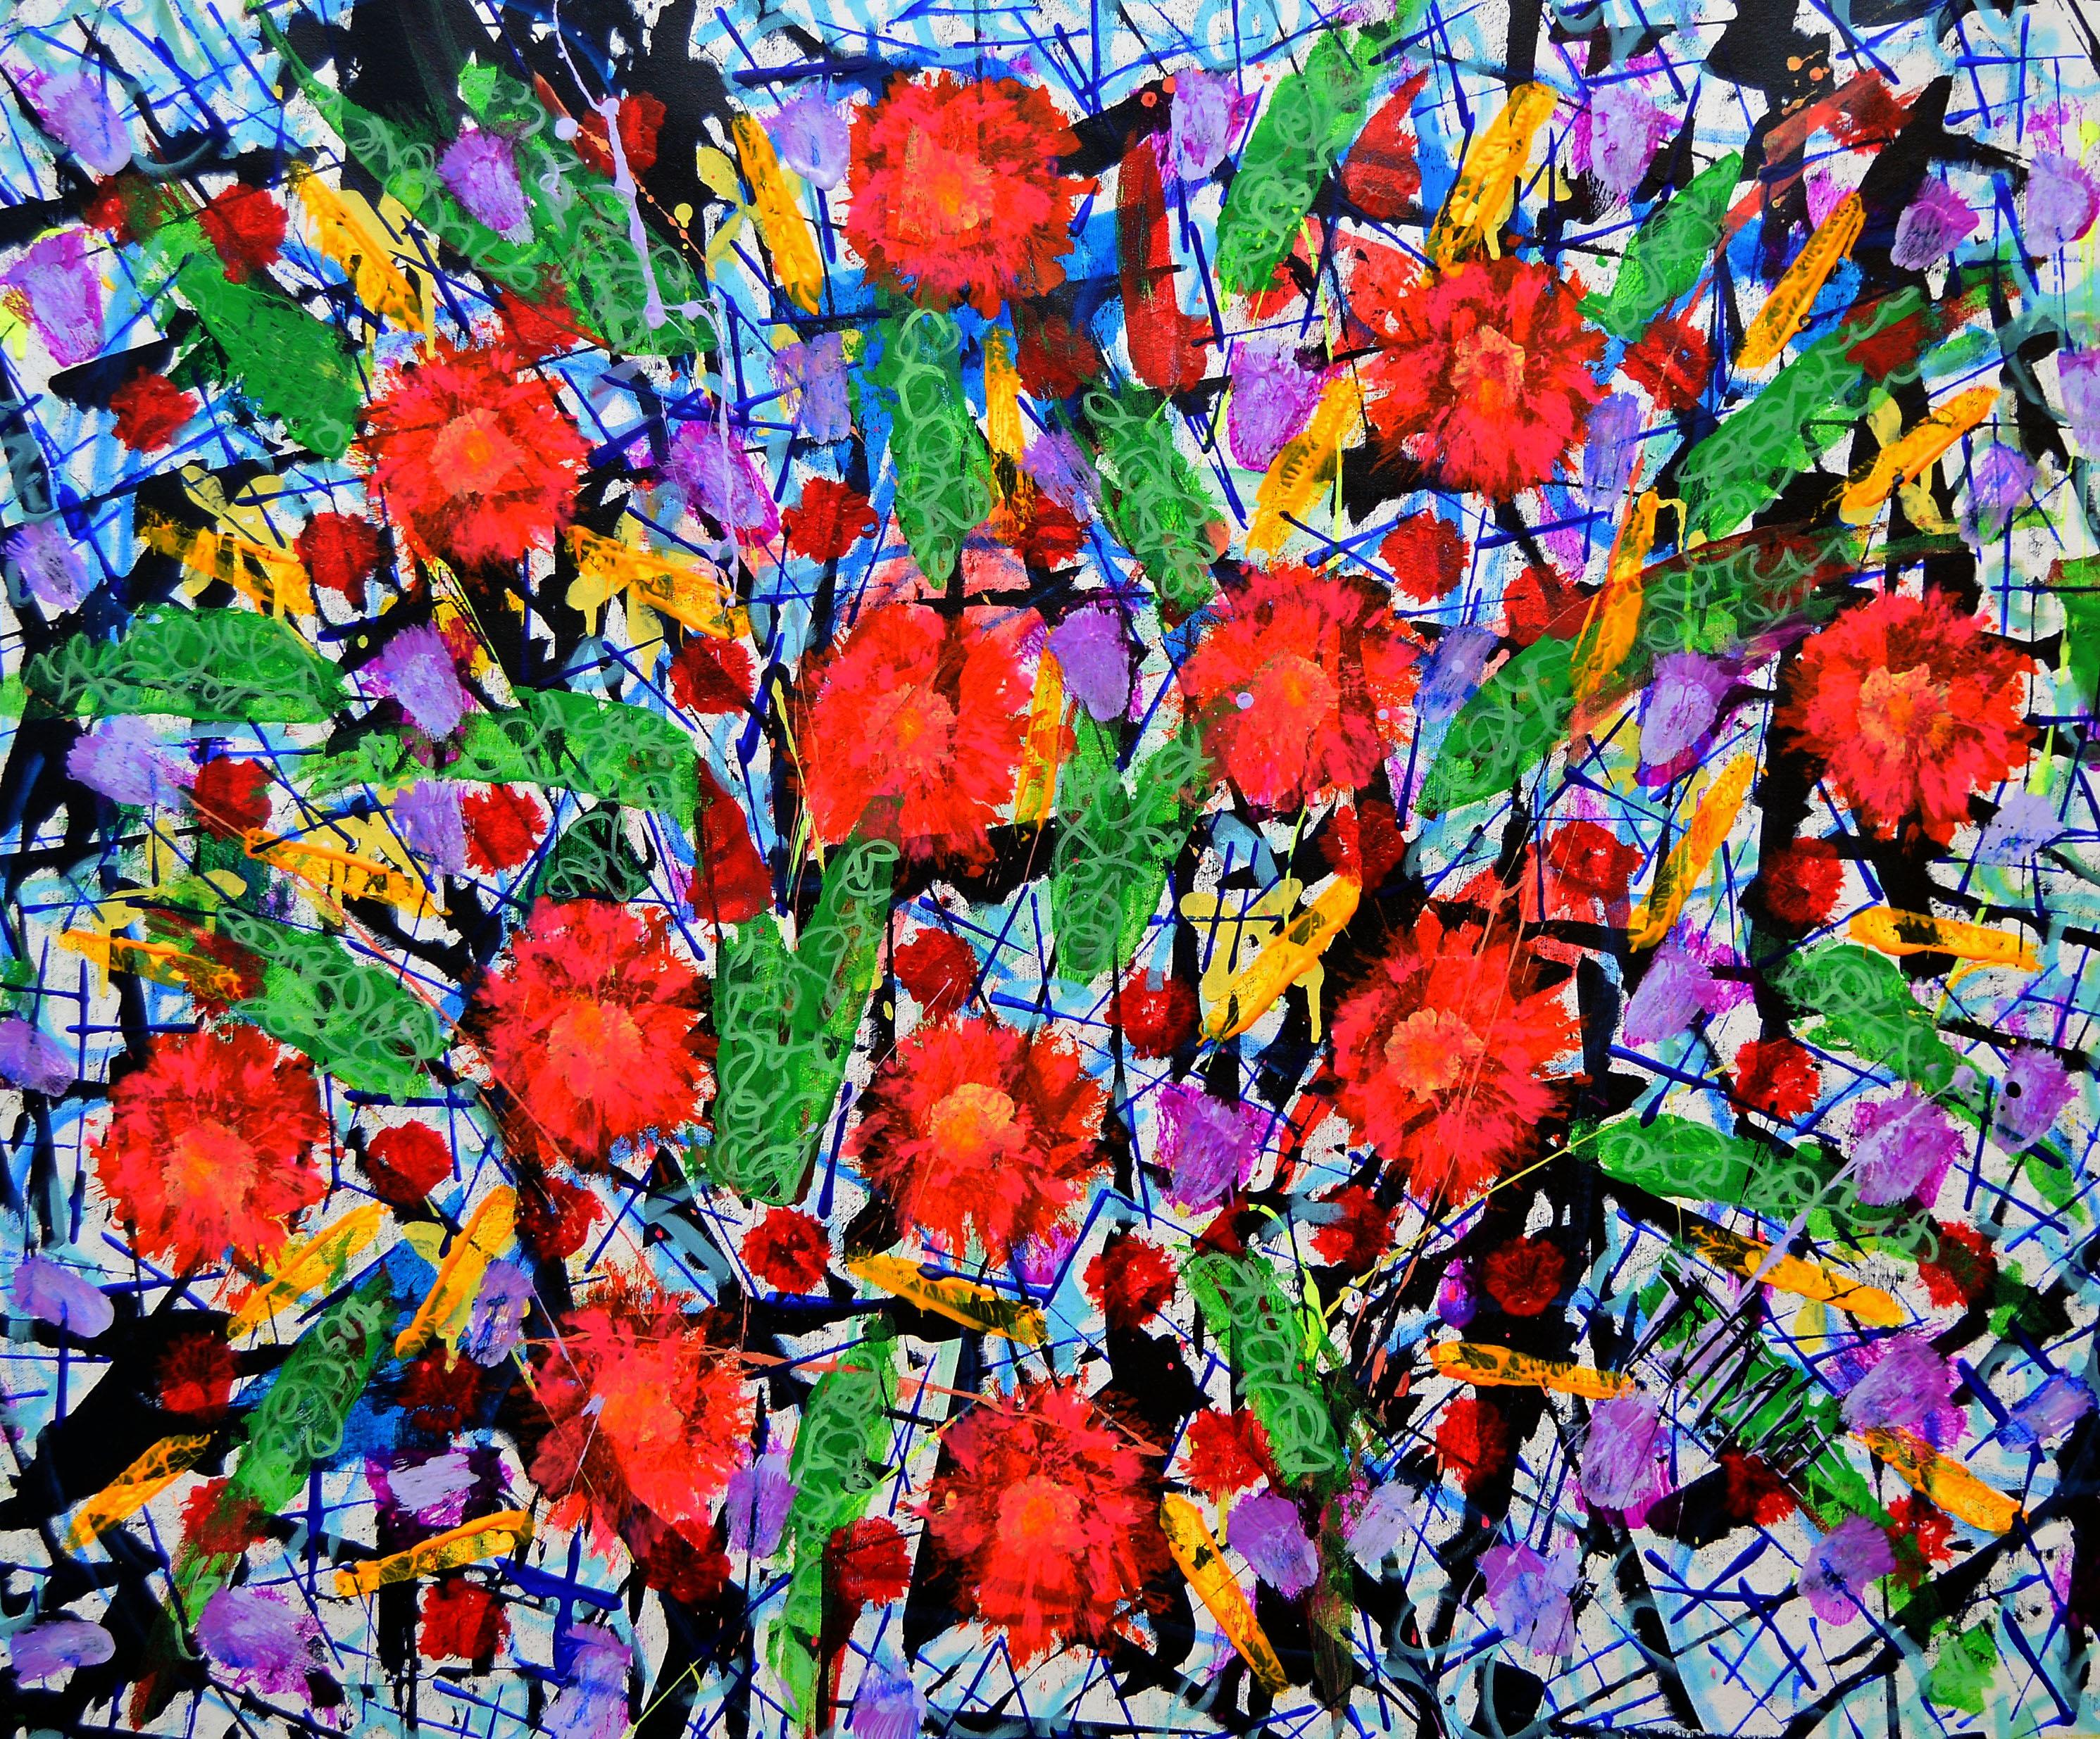 Found Florale artwork by Franck de las Mercedes - art listed for sale on Artplode